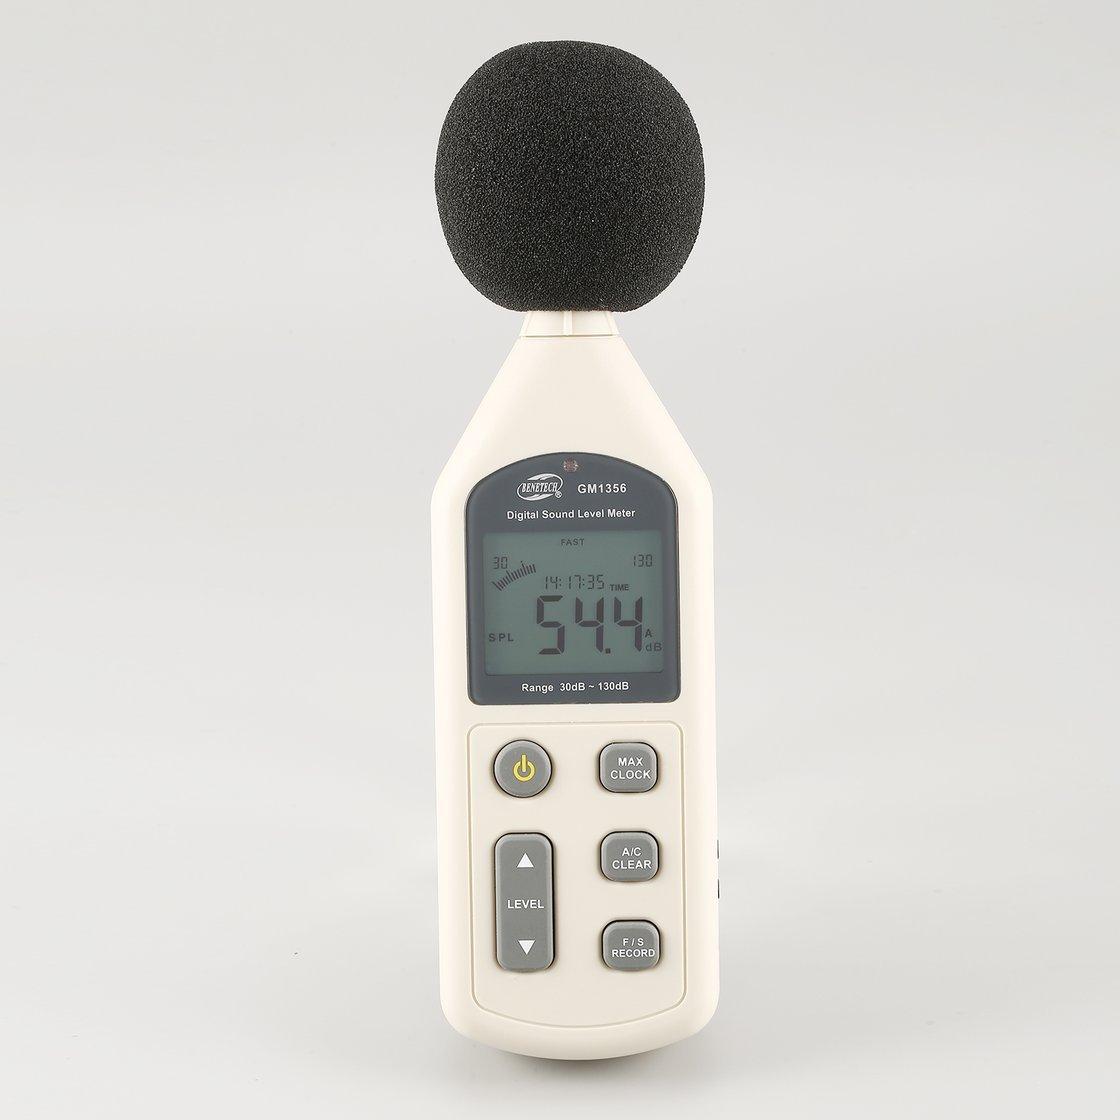 BENETECH GM1356 30-130dB A/C Digital Sound Level Meter Noise Volume Tester Fast/Slow dB Decibels Detector with Backlight USB